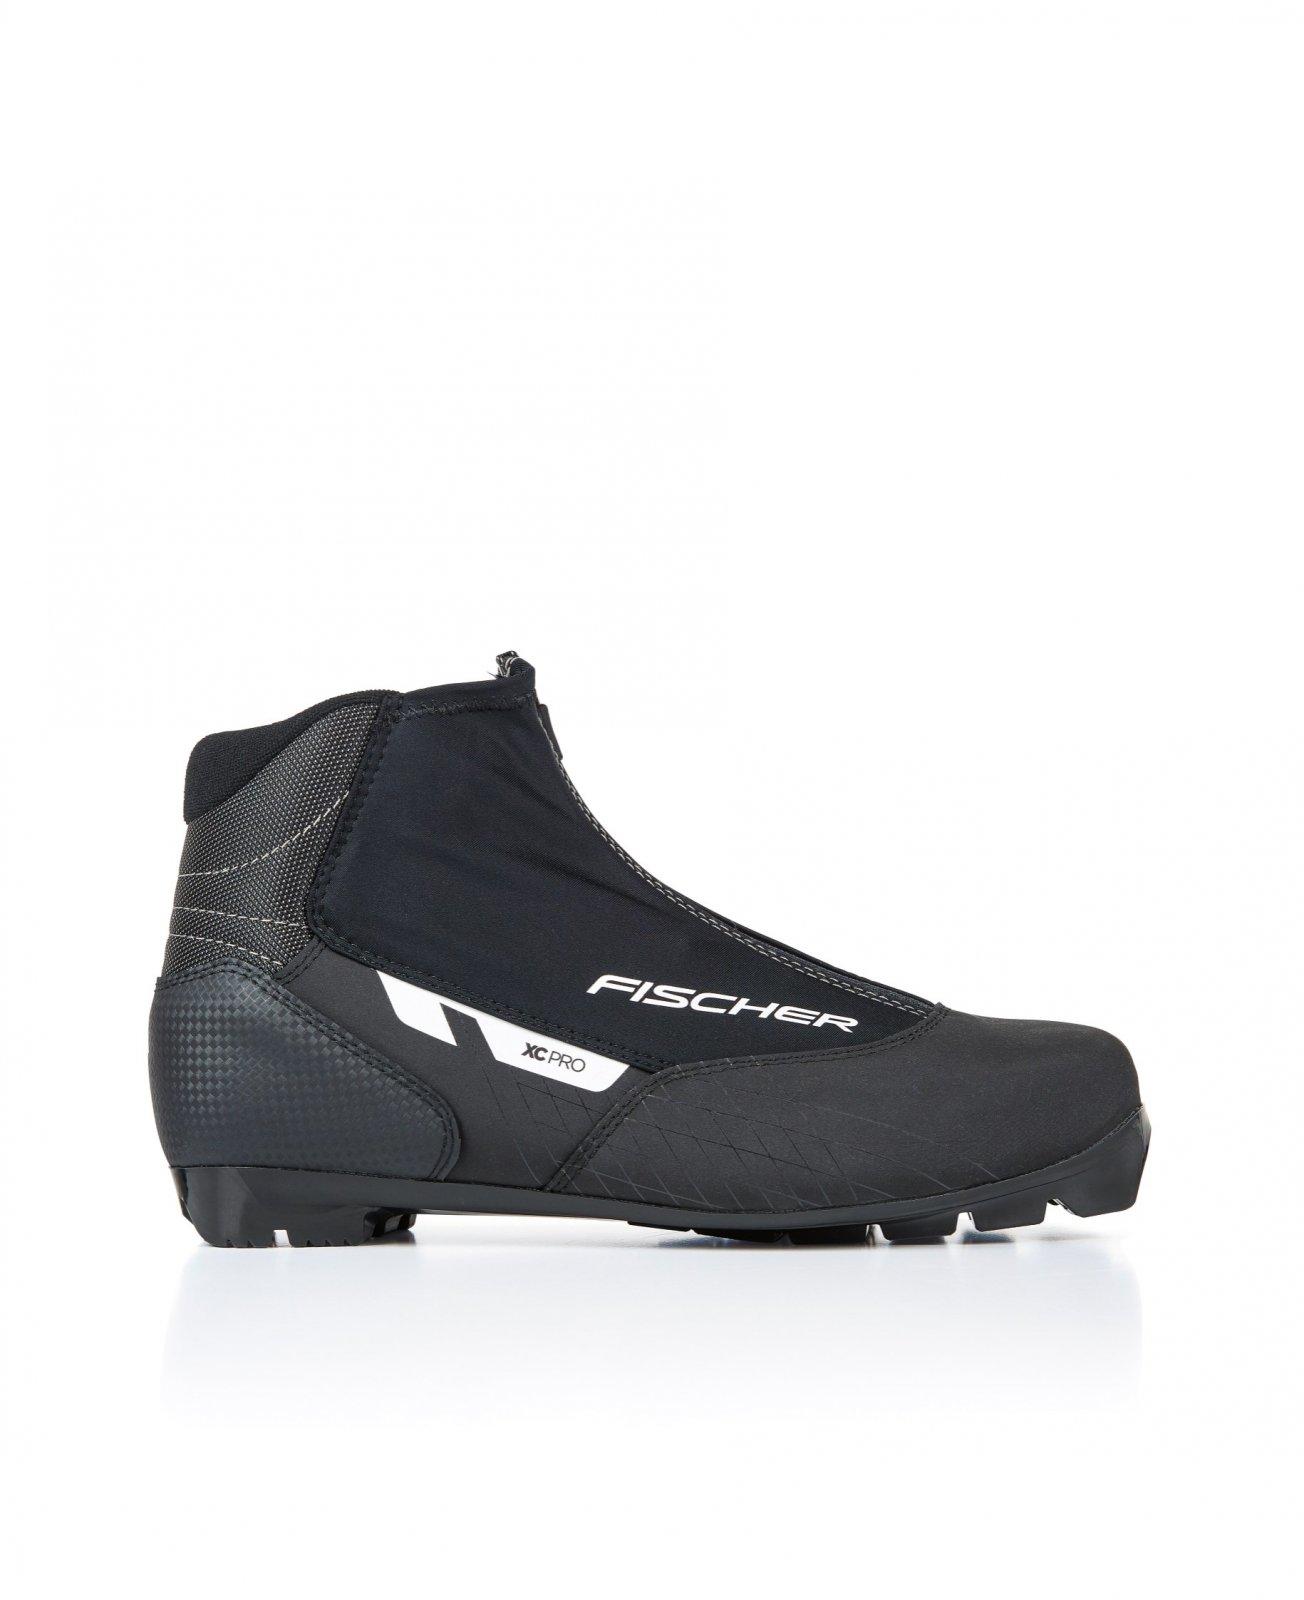 2021 Fischer XC Pro Black Men's XC Ski Boots